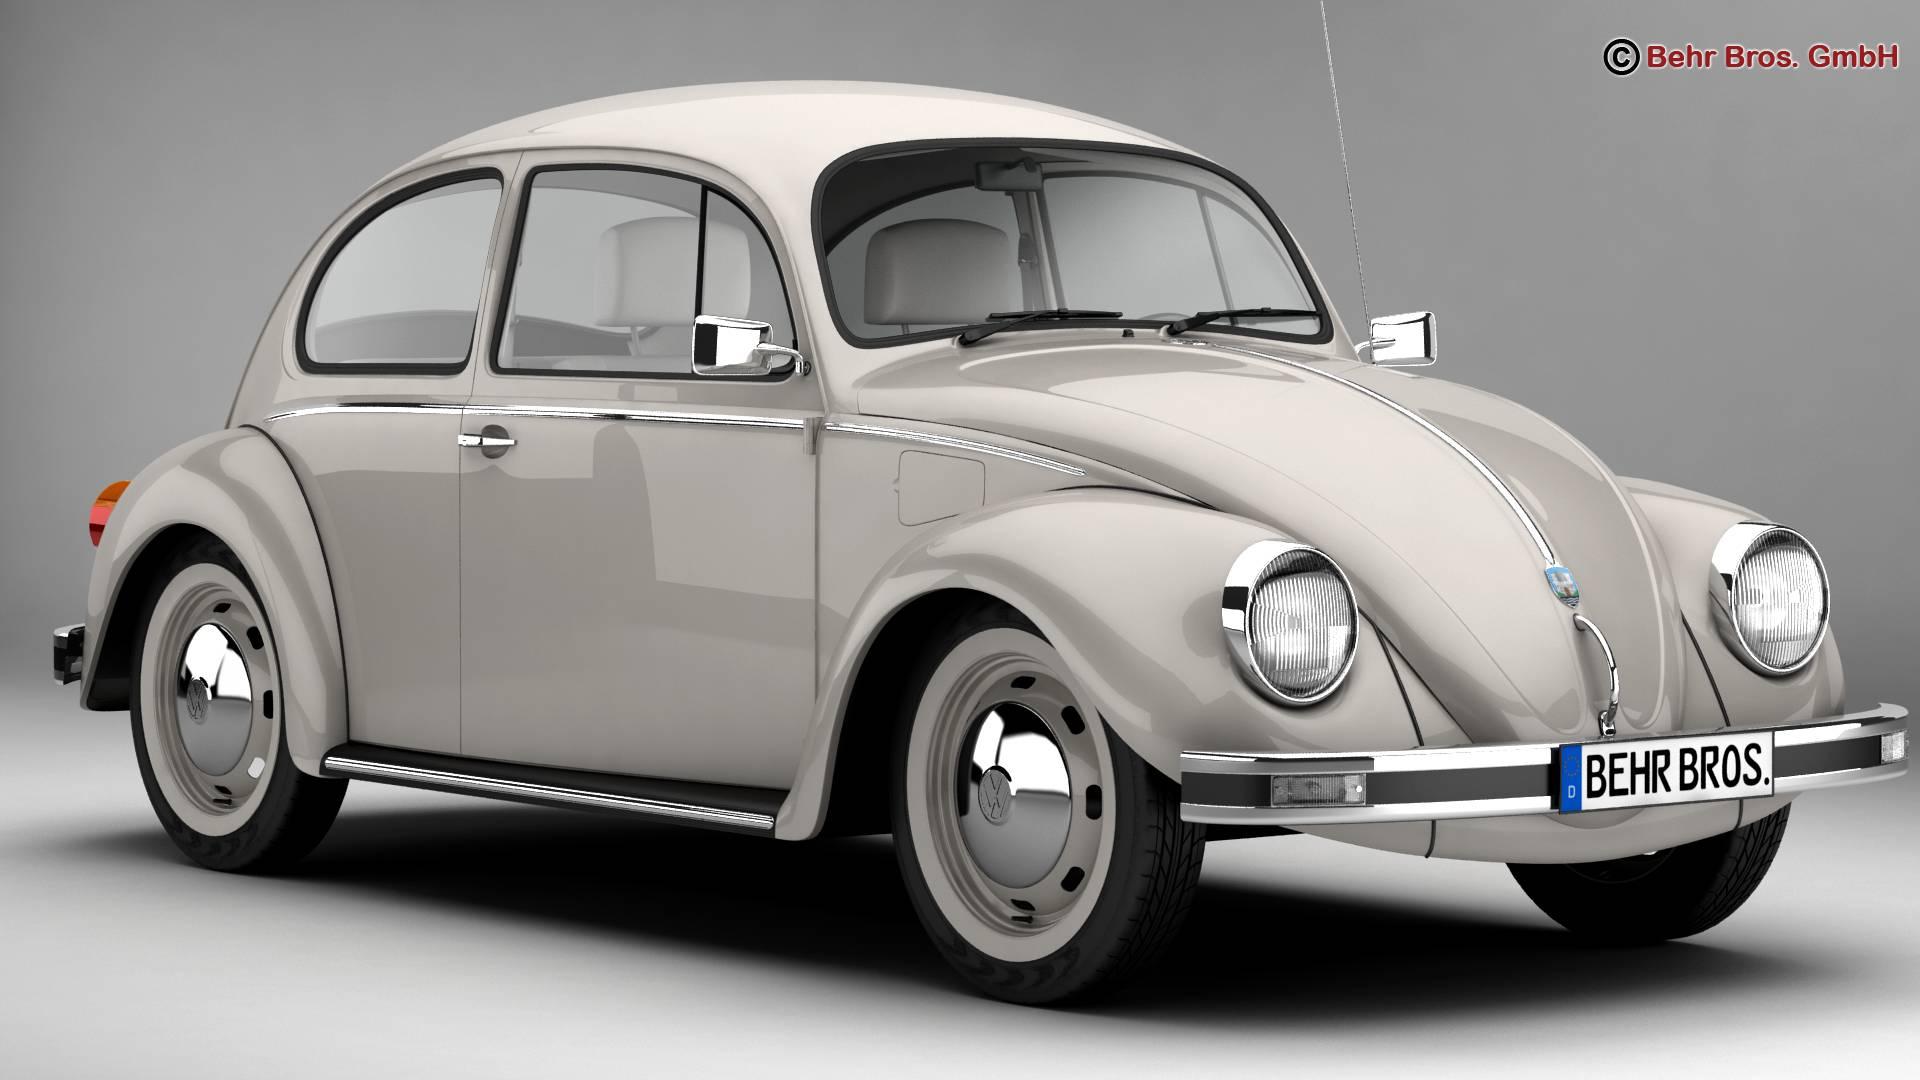 volkswagen beetle 2003 ultima edicion 3d model buy. Black Bedroom Furniture Sets. Home Design Ideas